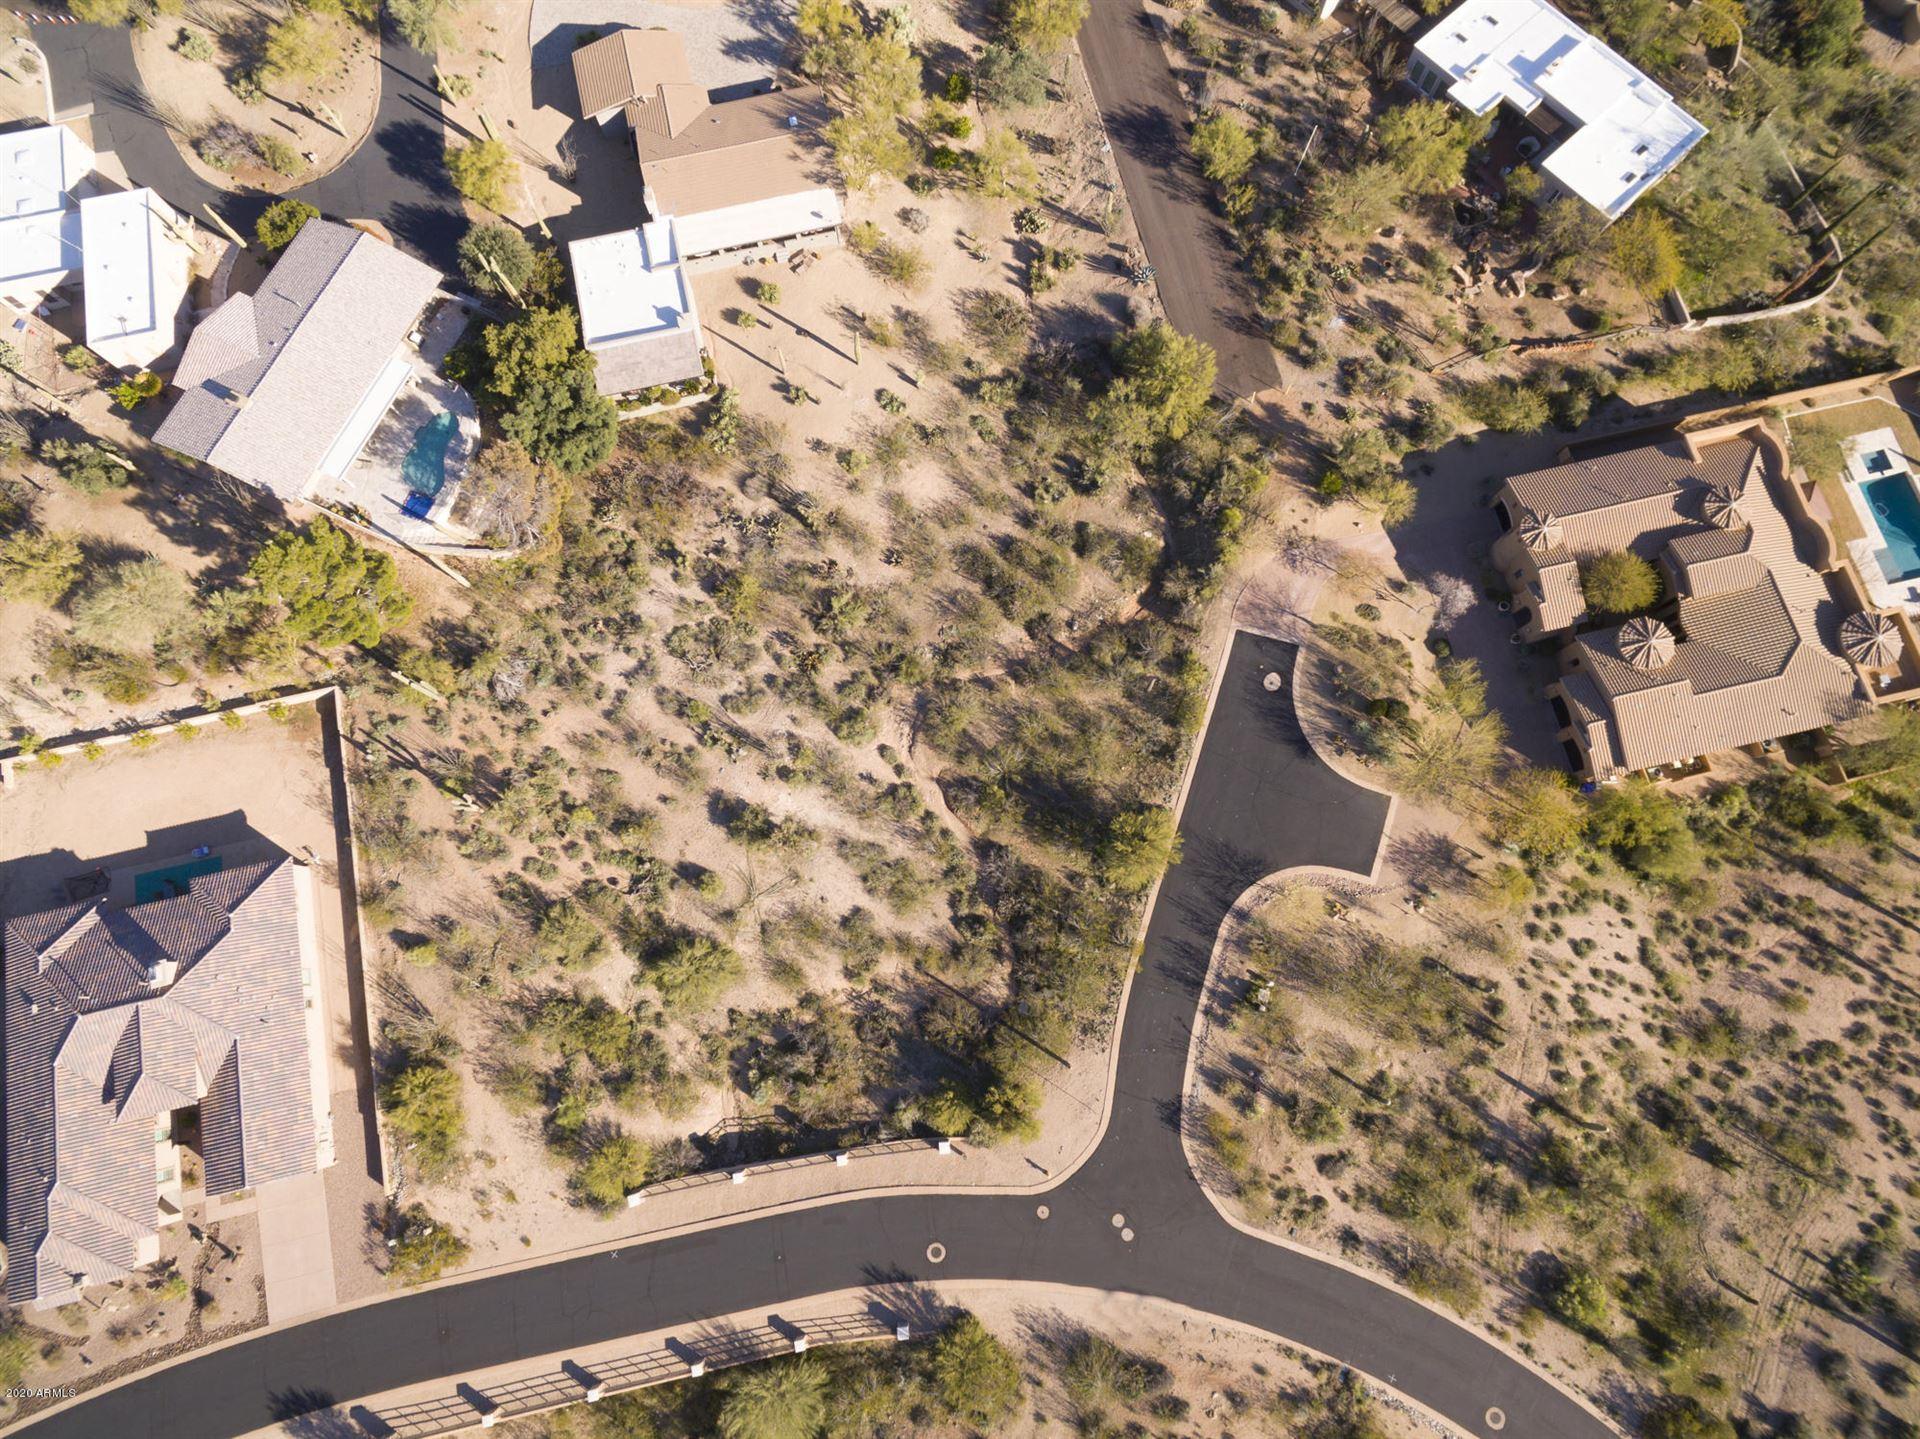 Photo of 37145 N WINDING WASH Trail, Carefree, AZ 85377 (MLS # 6192157)